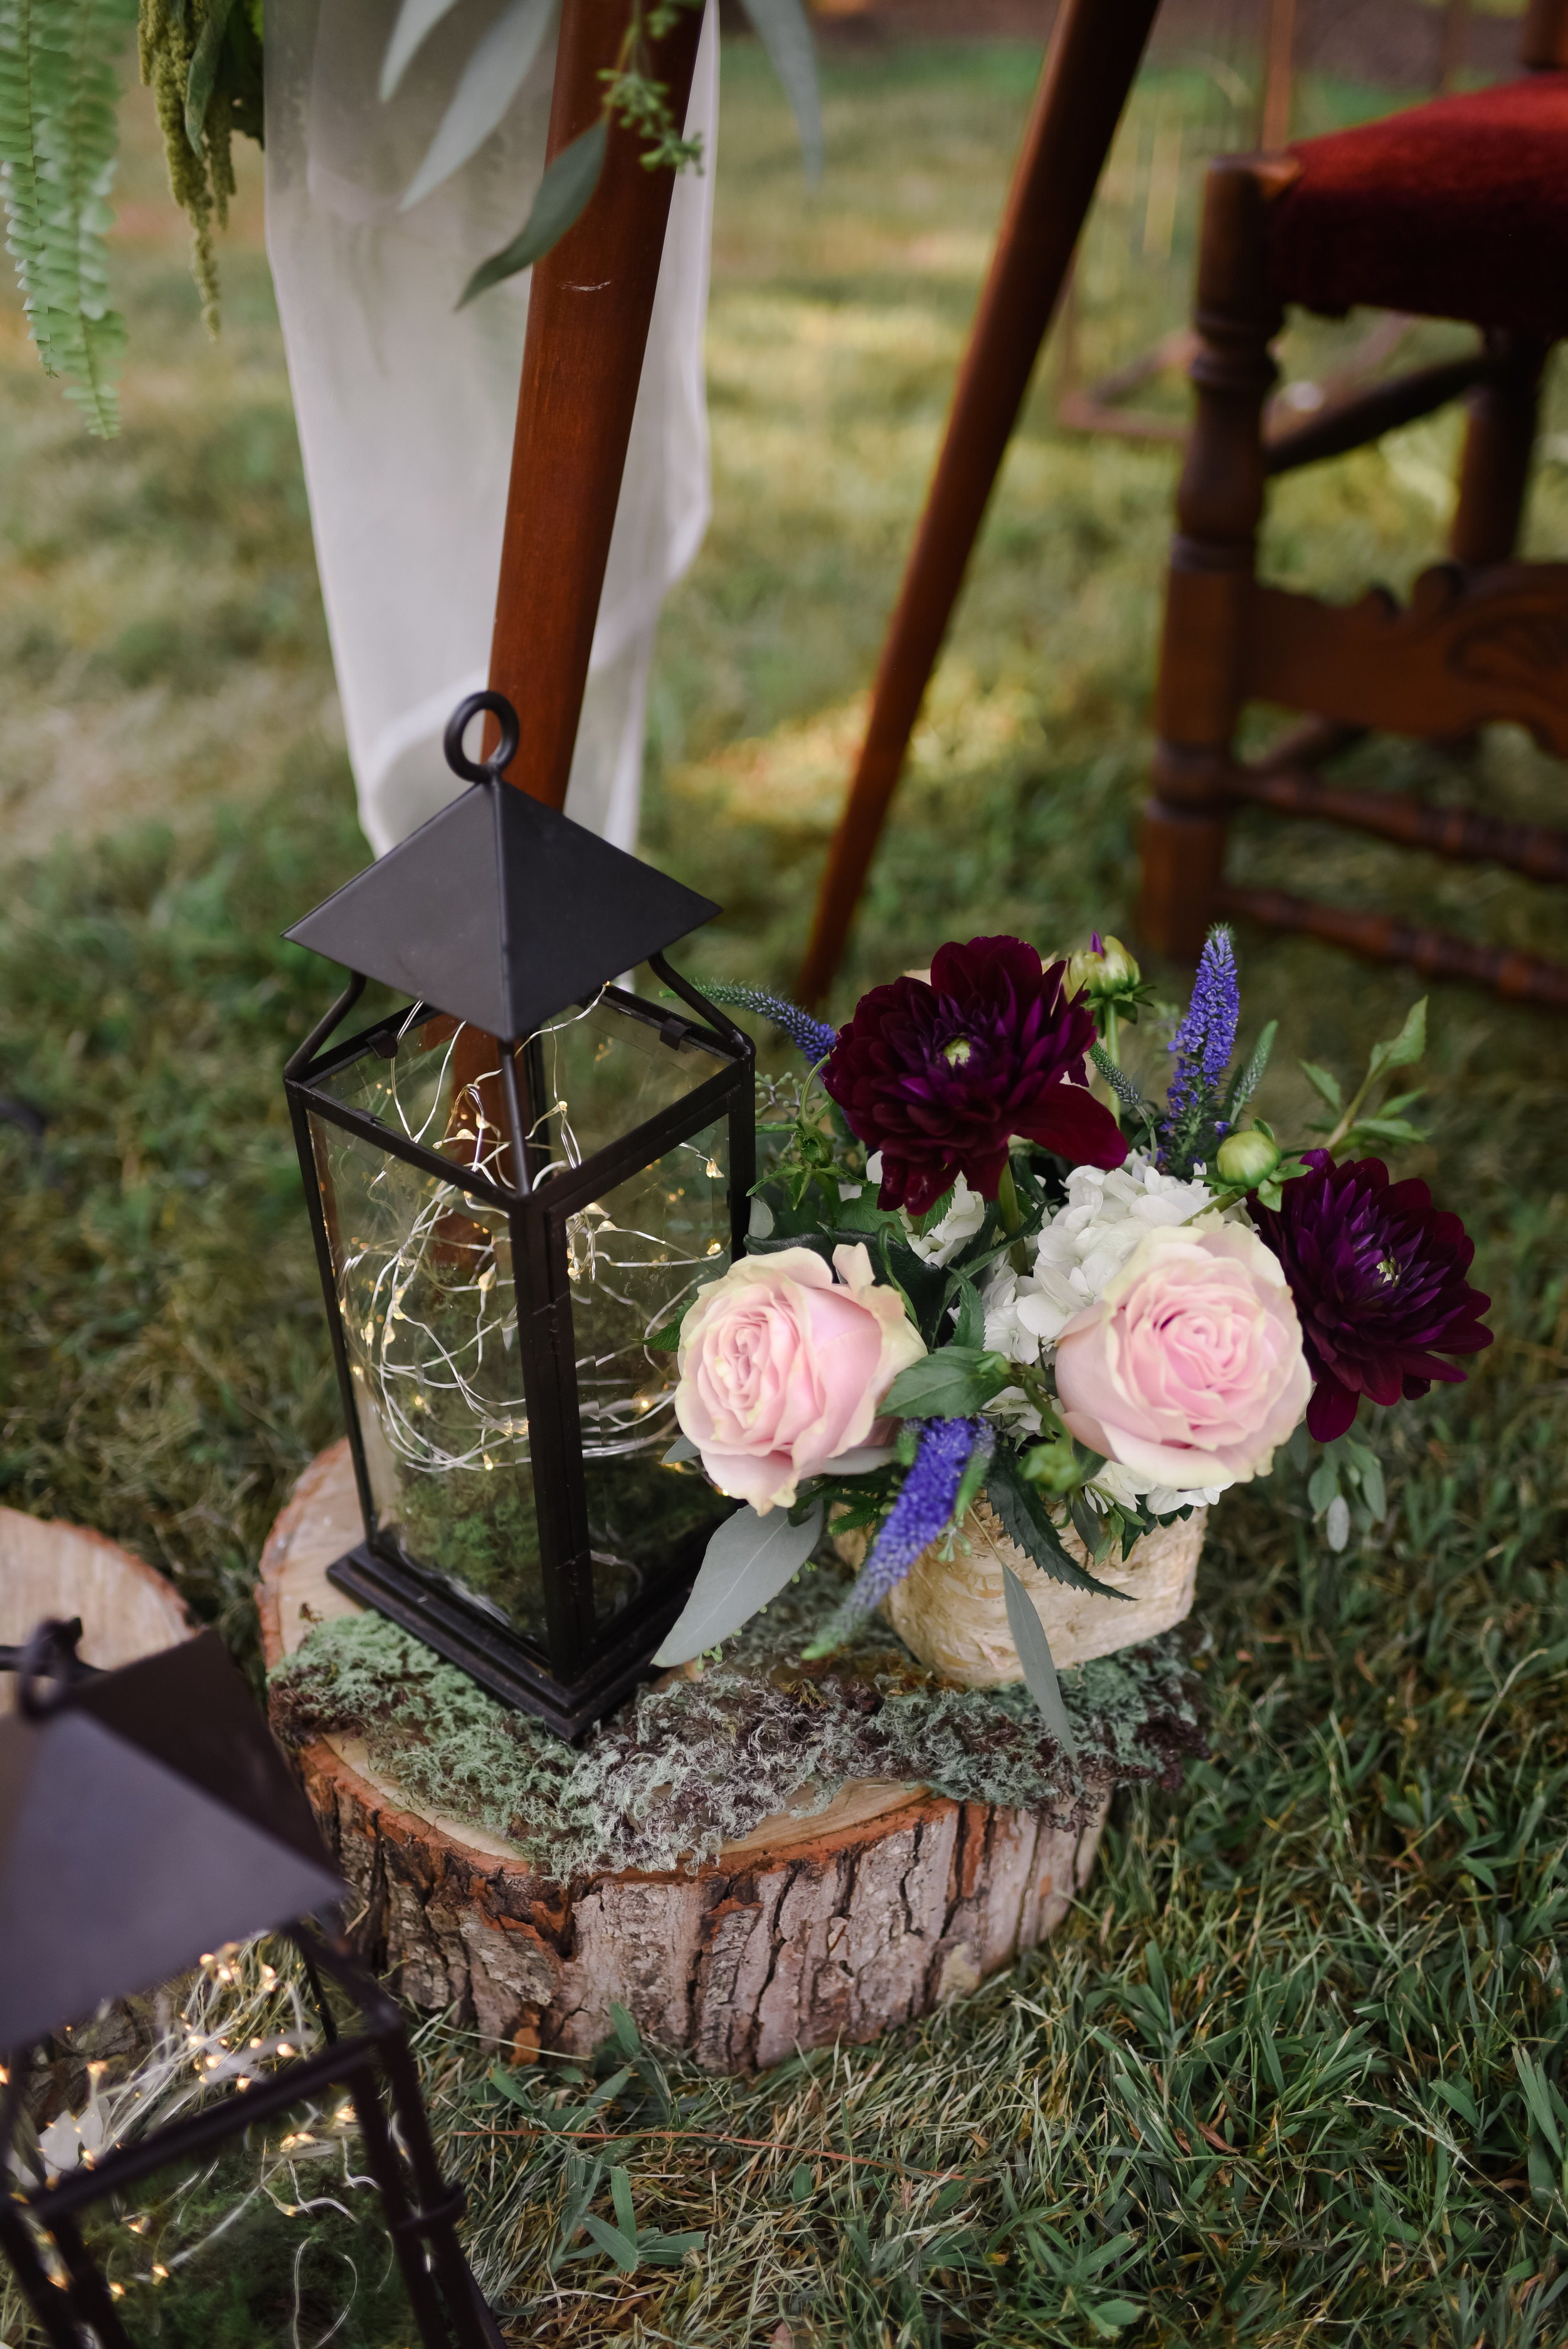 midsummers-eve-wedding-floral-blush-dress-david-tutera-cary-hill-plantation-photo-virginia-bride-127.jpg